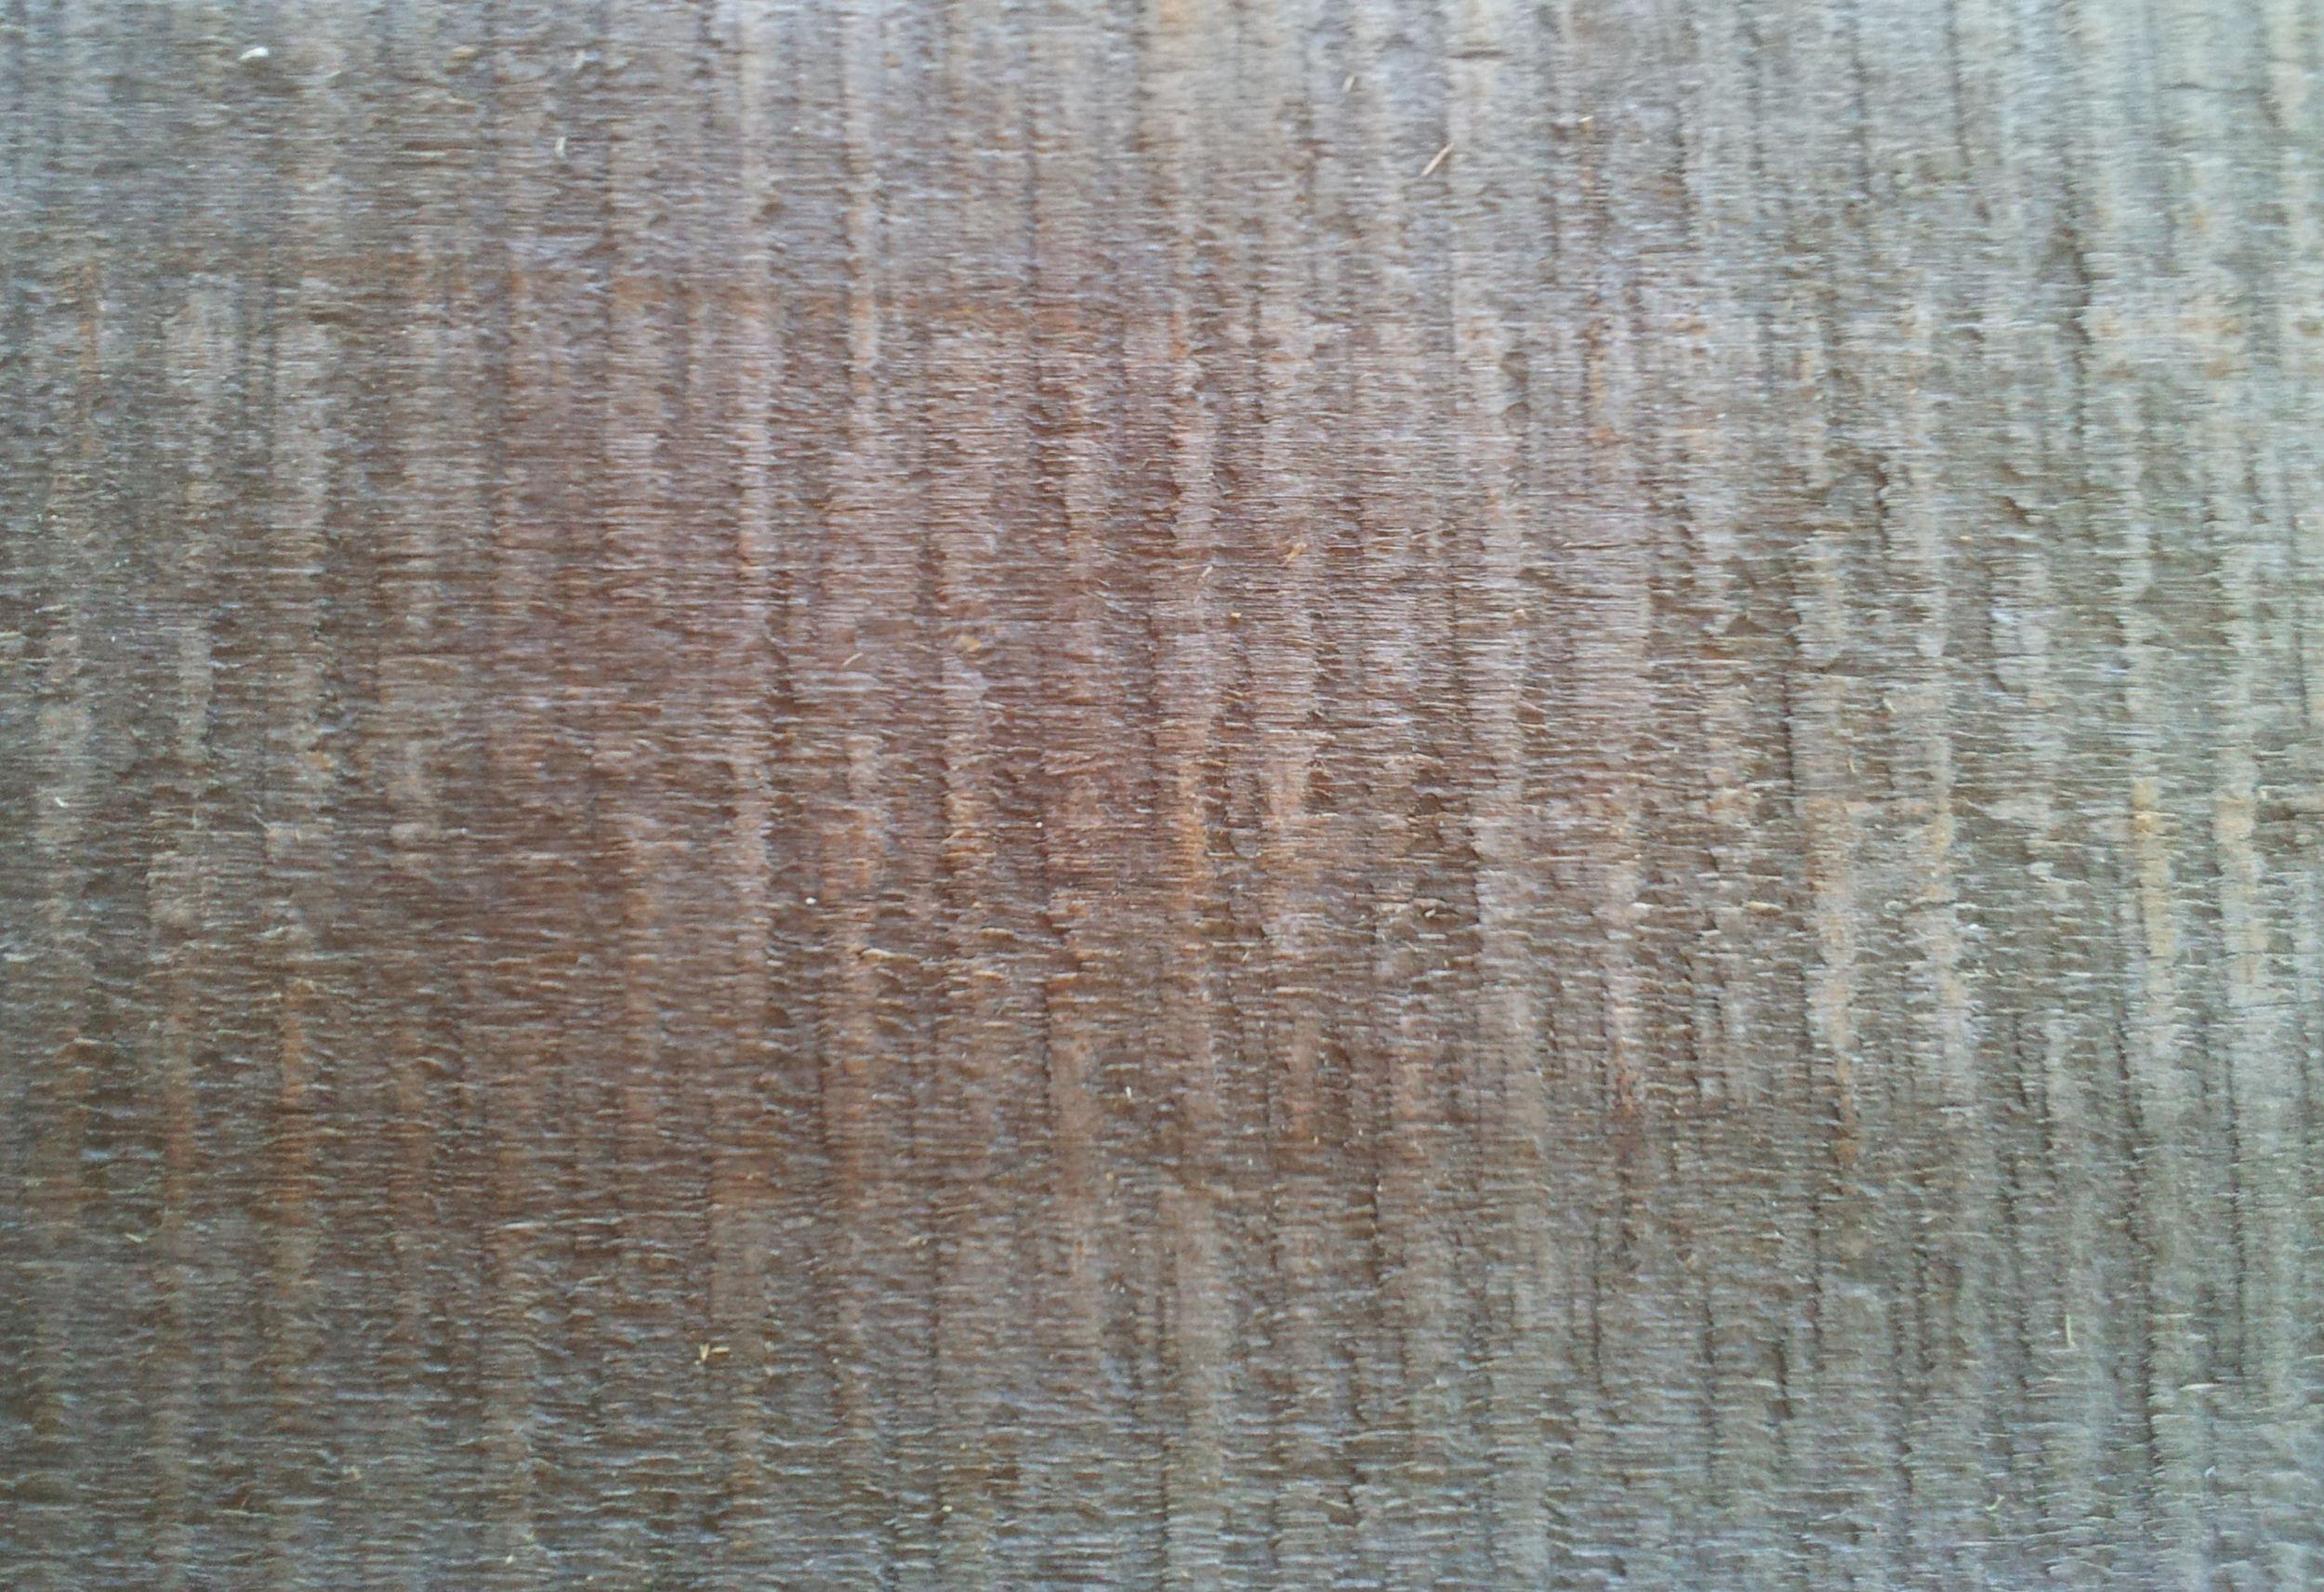 Bandsaw surface